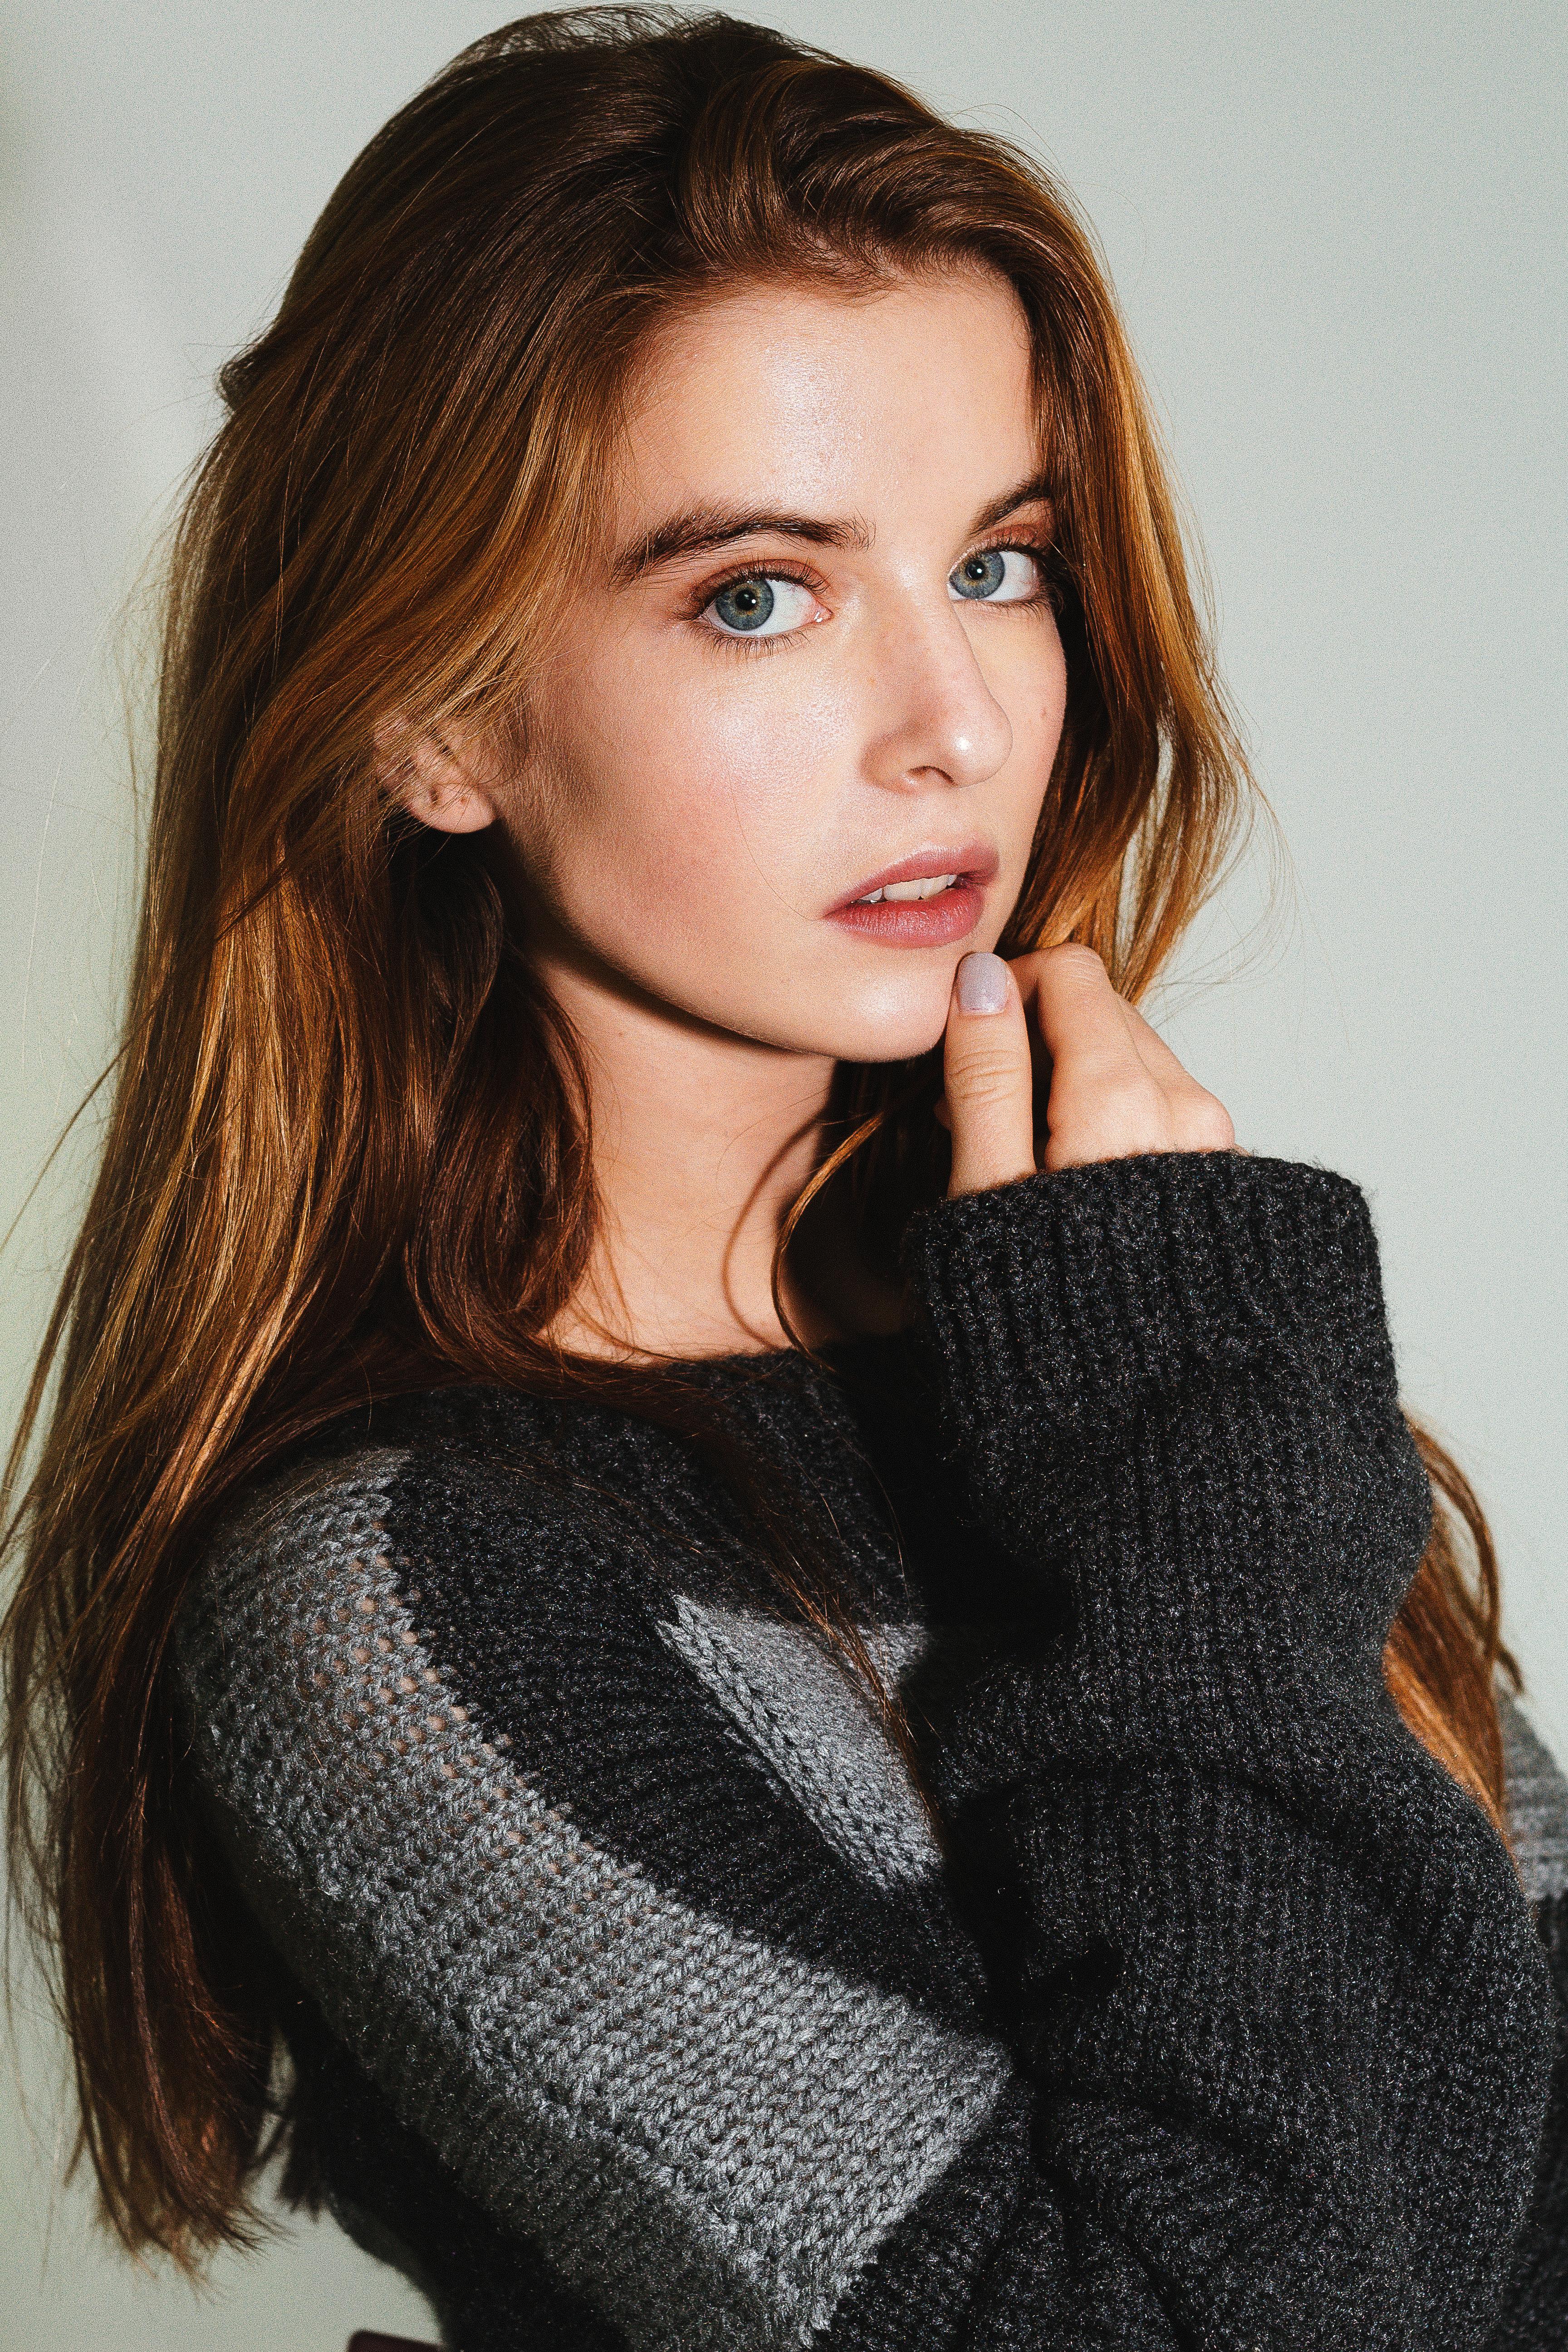 Amelia Prieto